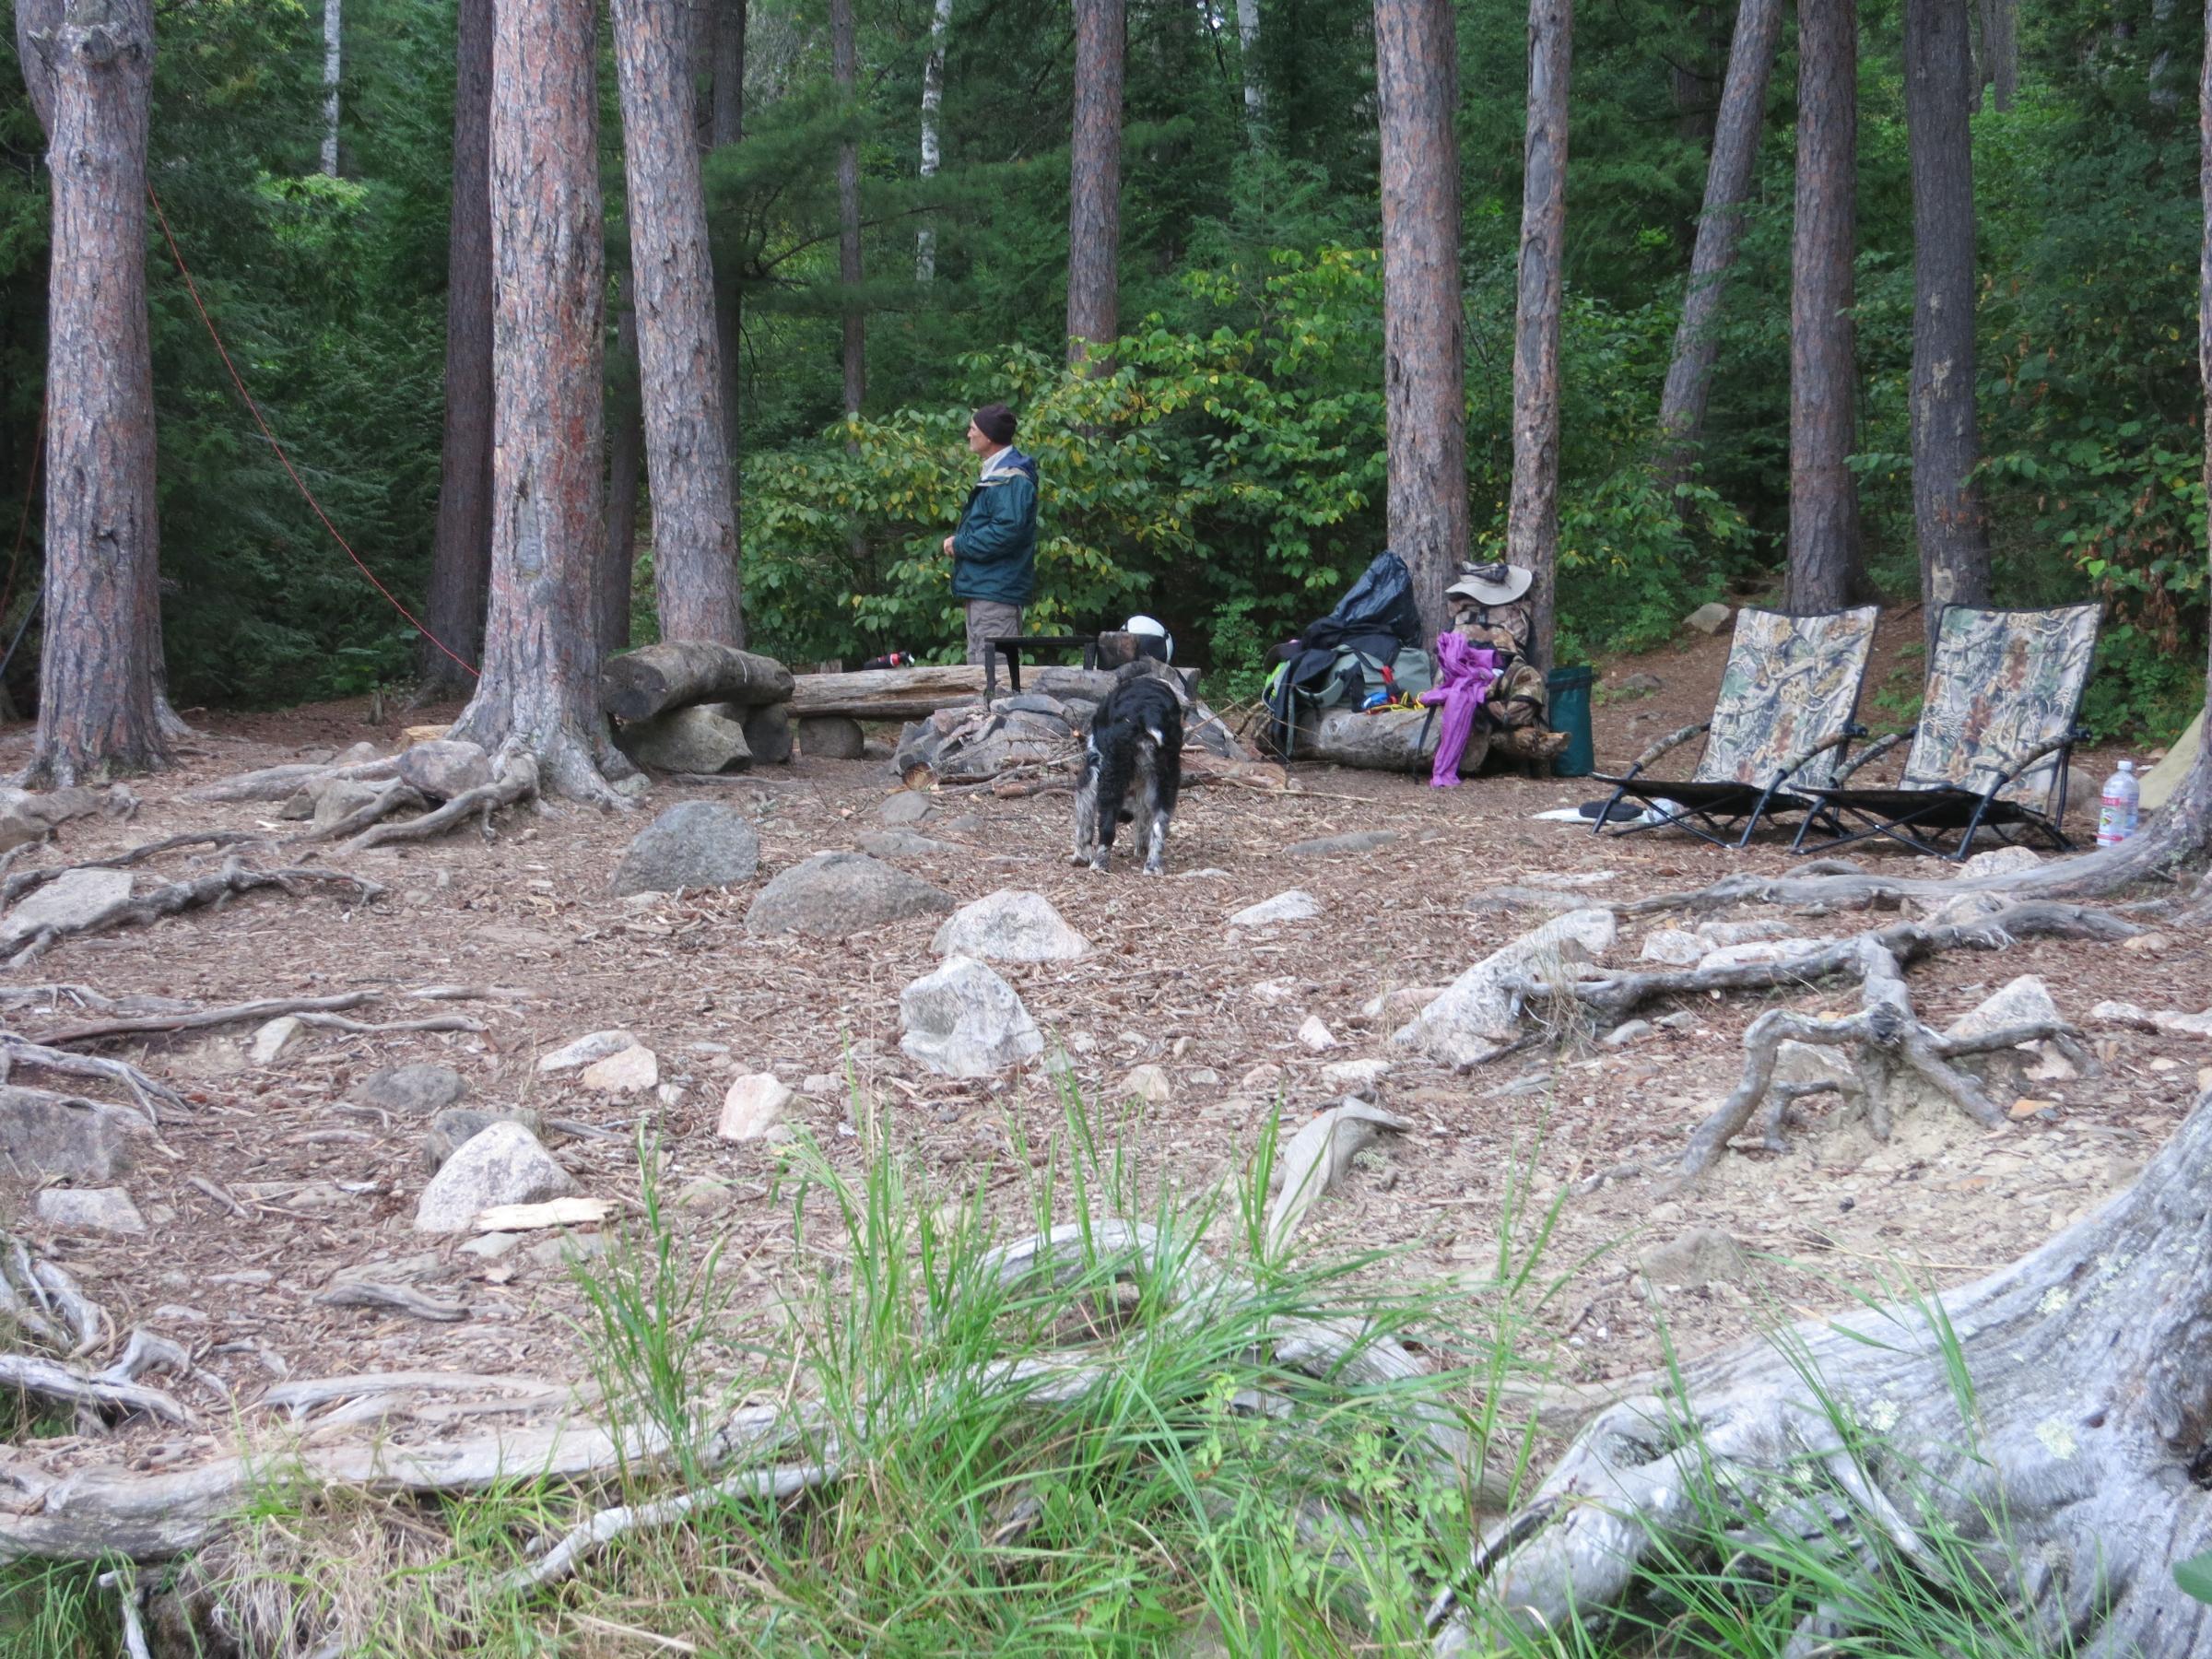 Campsite on Canoe